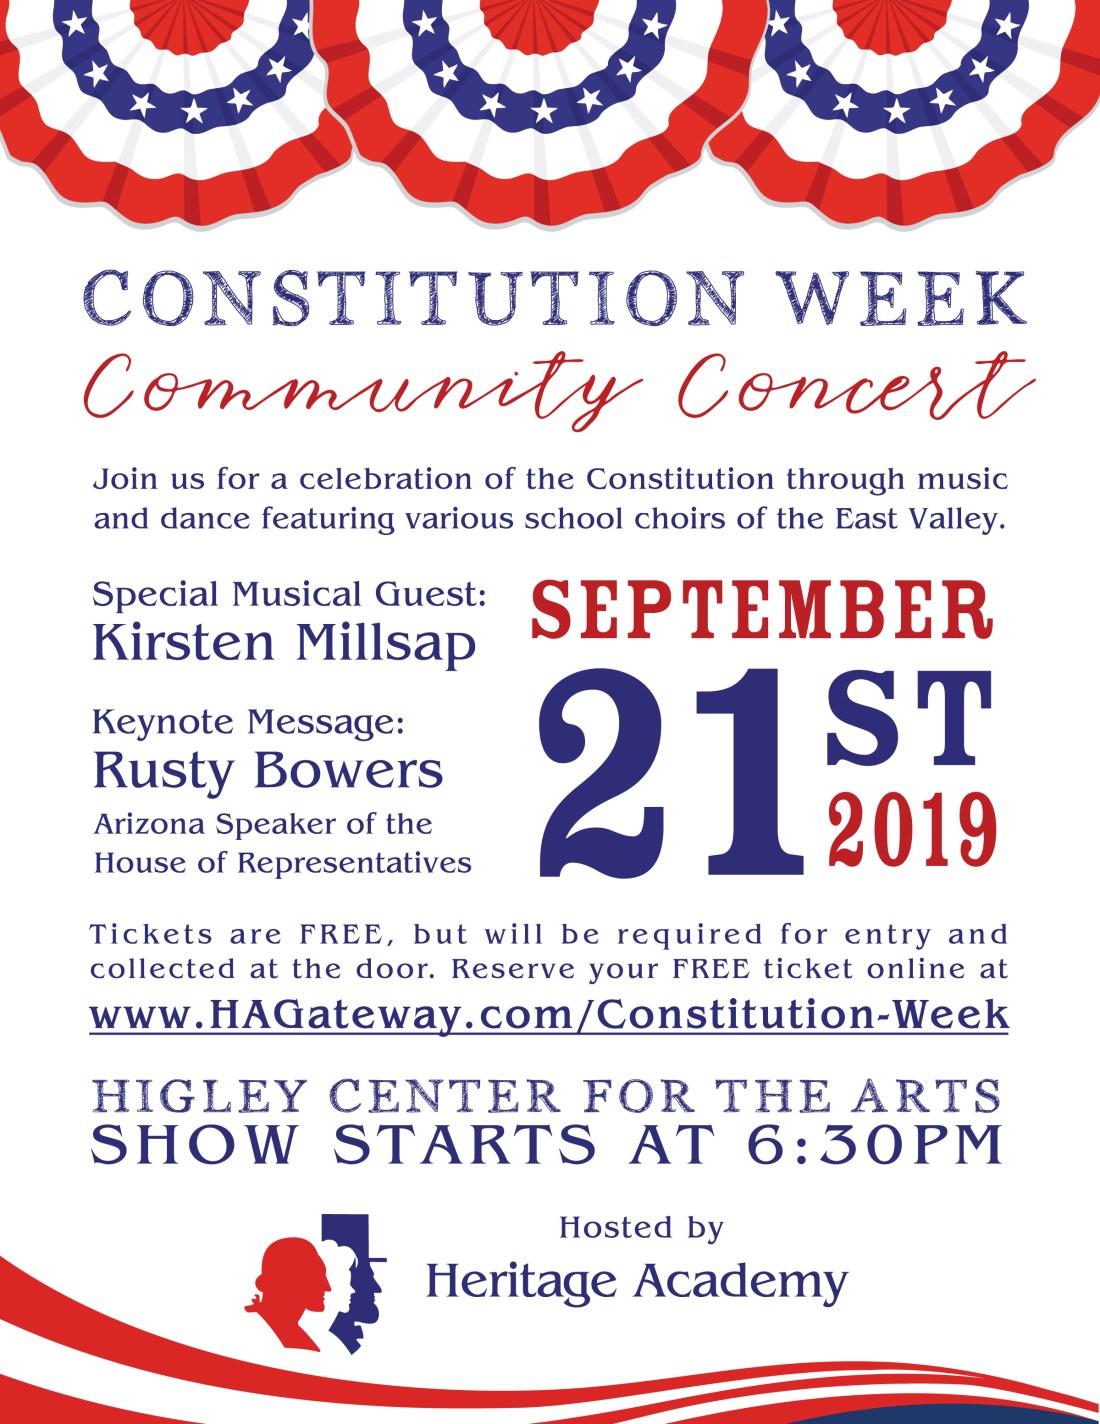 Constituion-Week-2019-2jpg